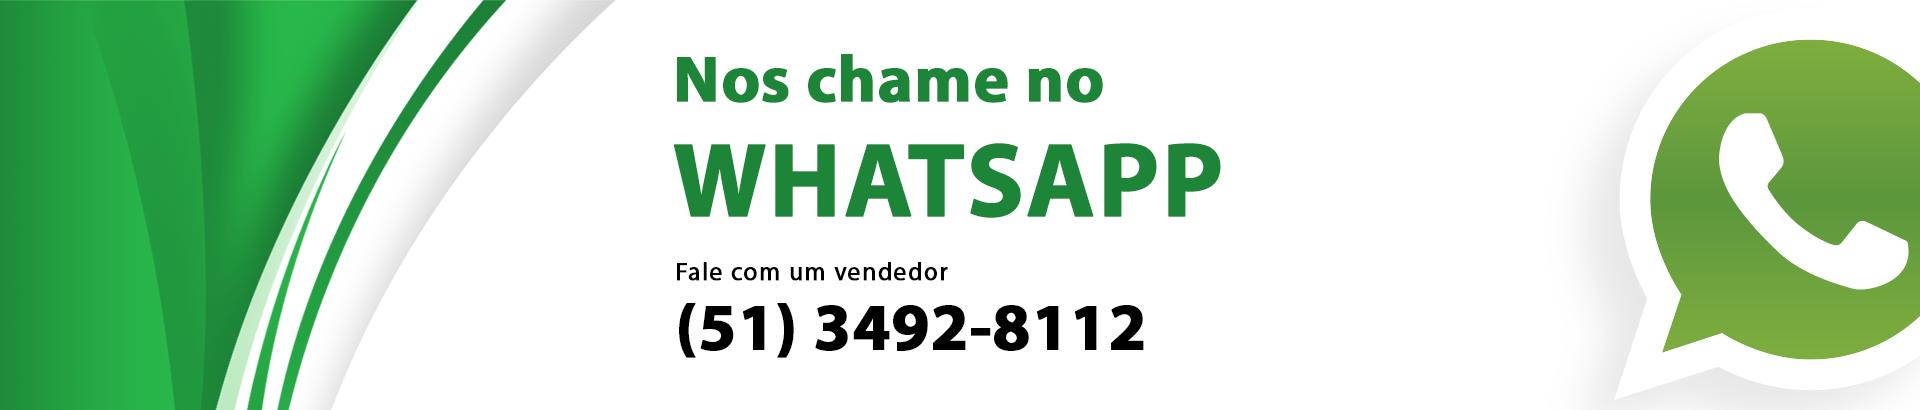 Nos chame no Whatsapp